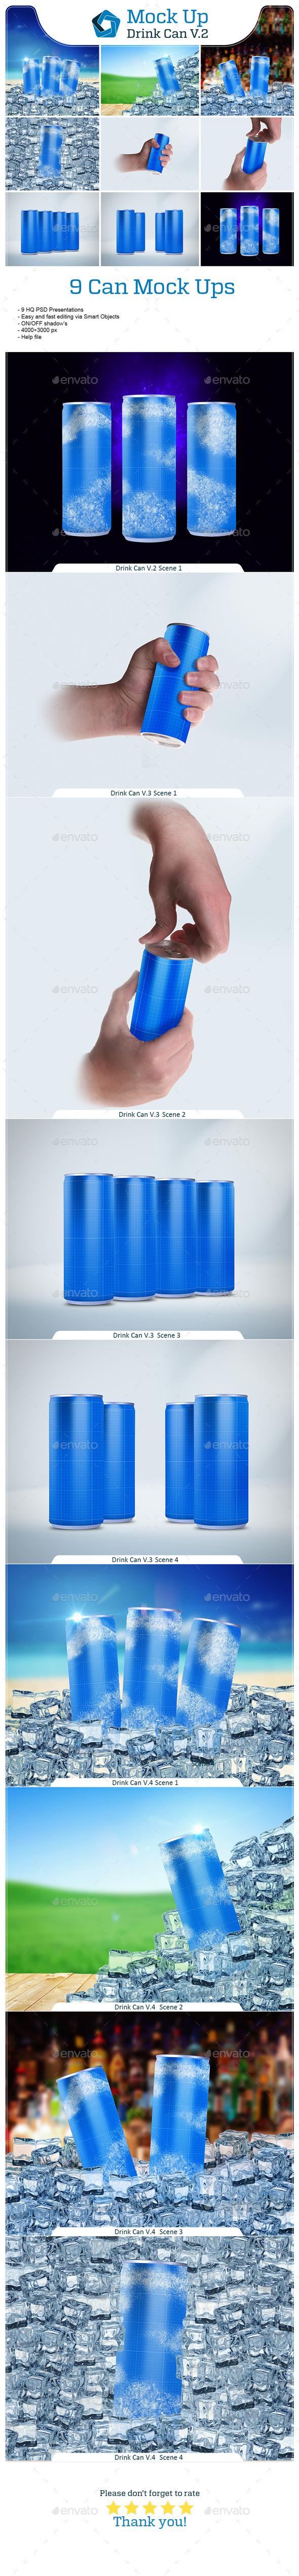 Drink Can Bundle V.2 - Food and Drink Packaging